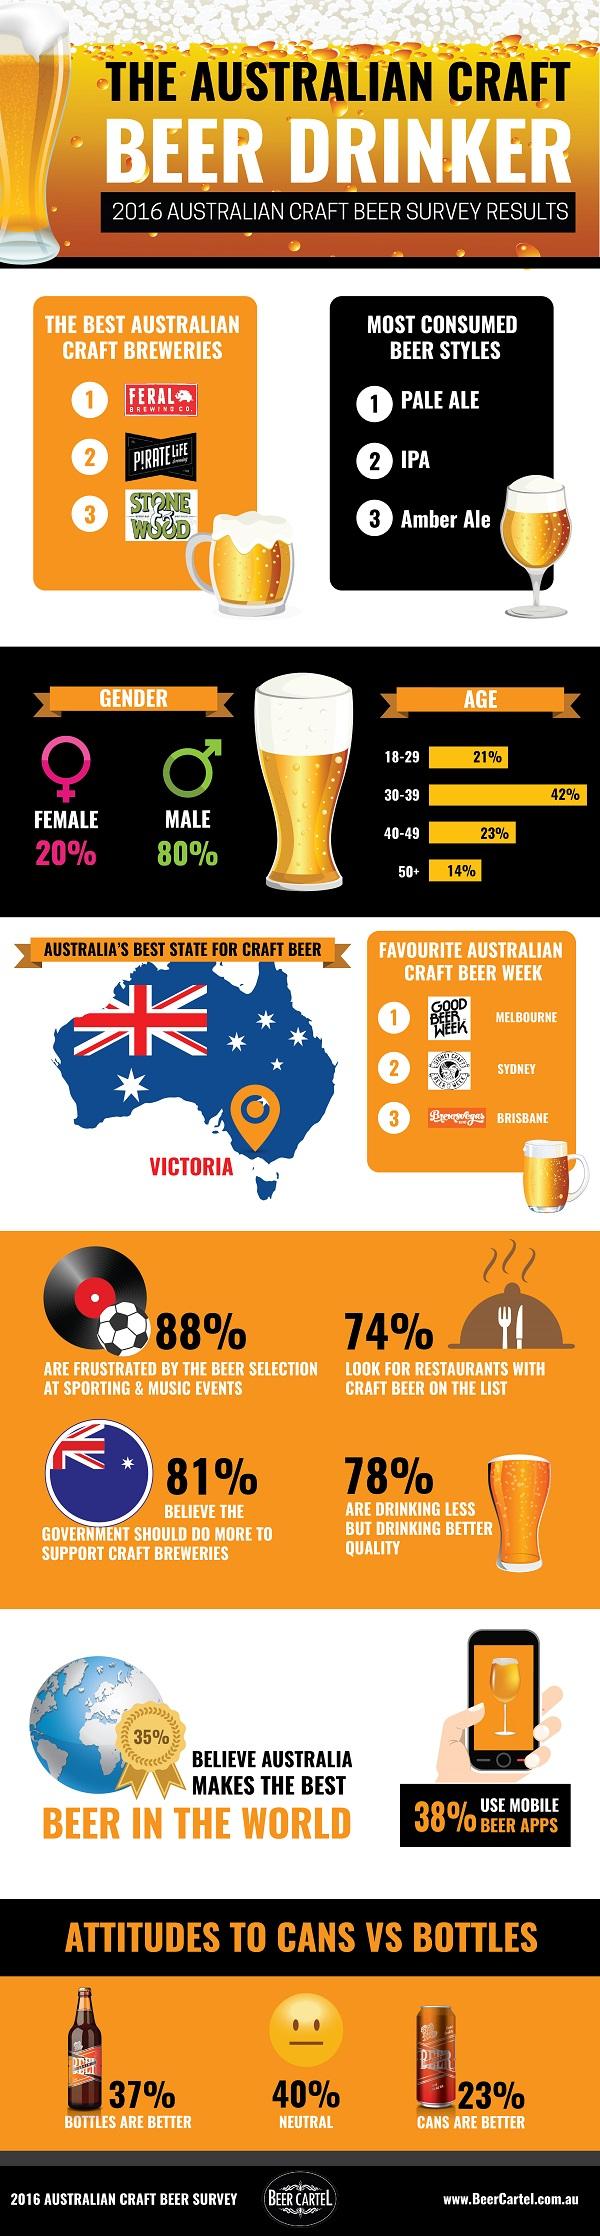 2016 Australian Craft Beer Survey Infographic